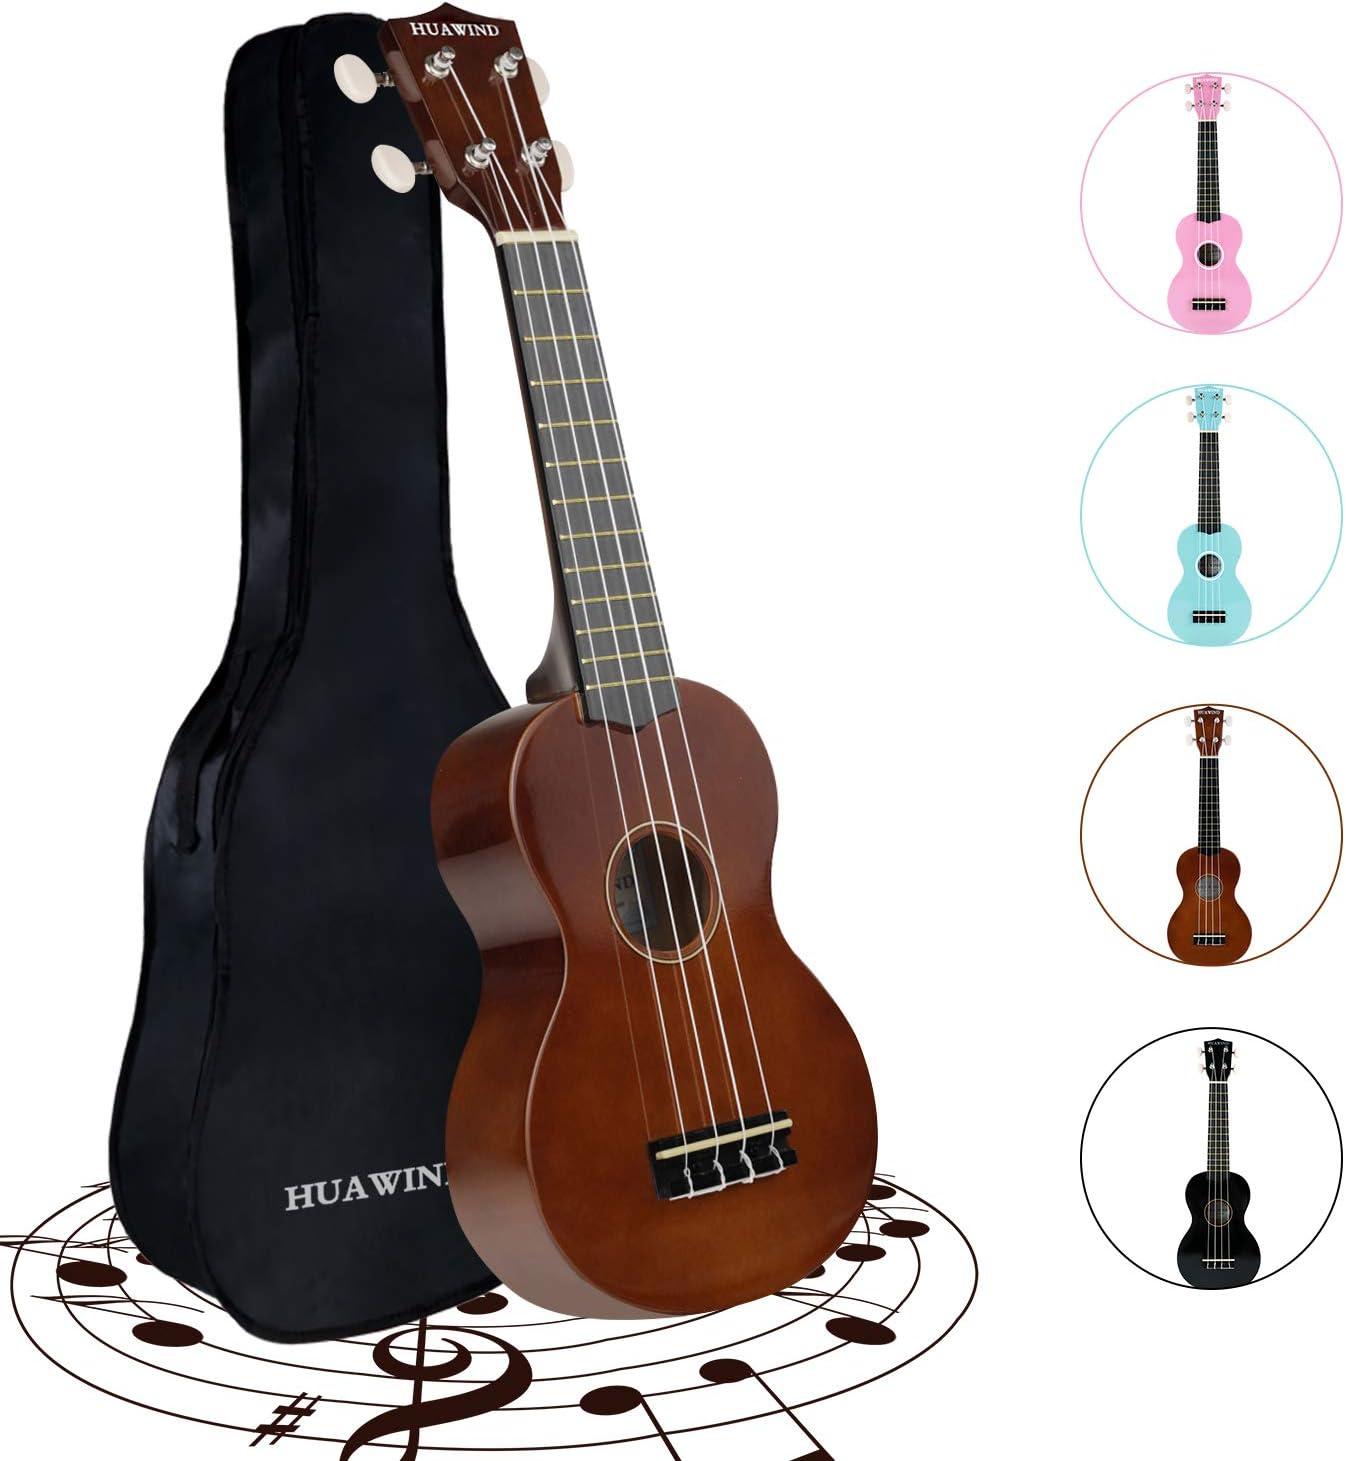 HUAWIND 21 Inch Soprano Ukulele for Beginners, Kid Guitar Four String Wood Children Ukulele with Gig Bag (Brown)